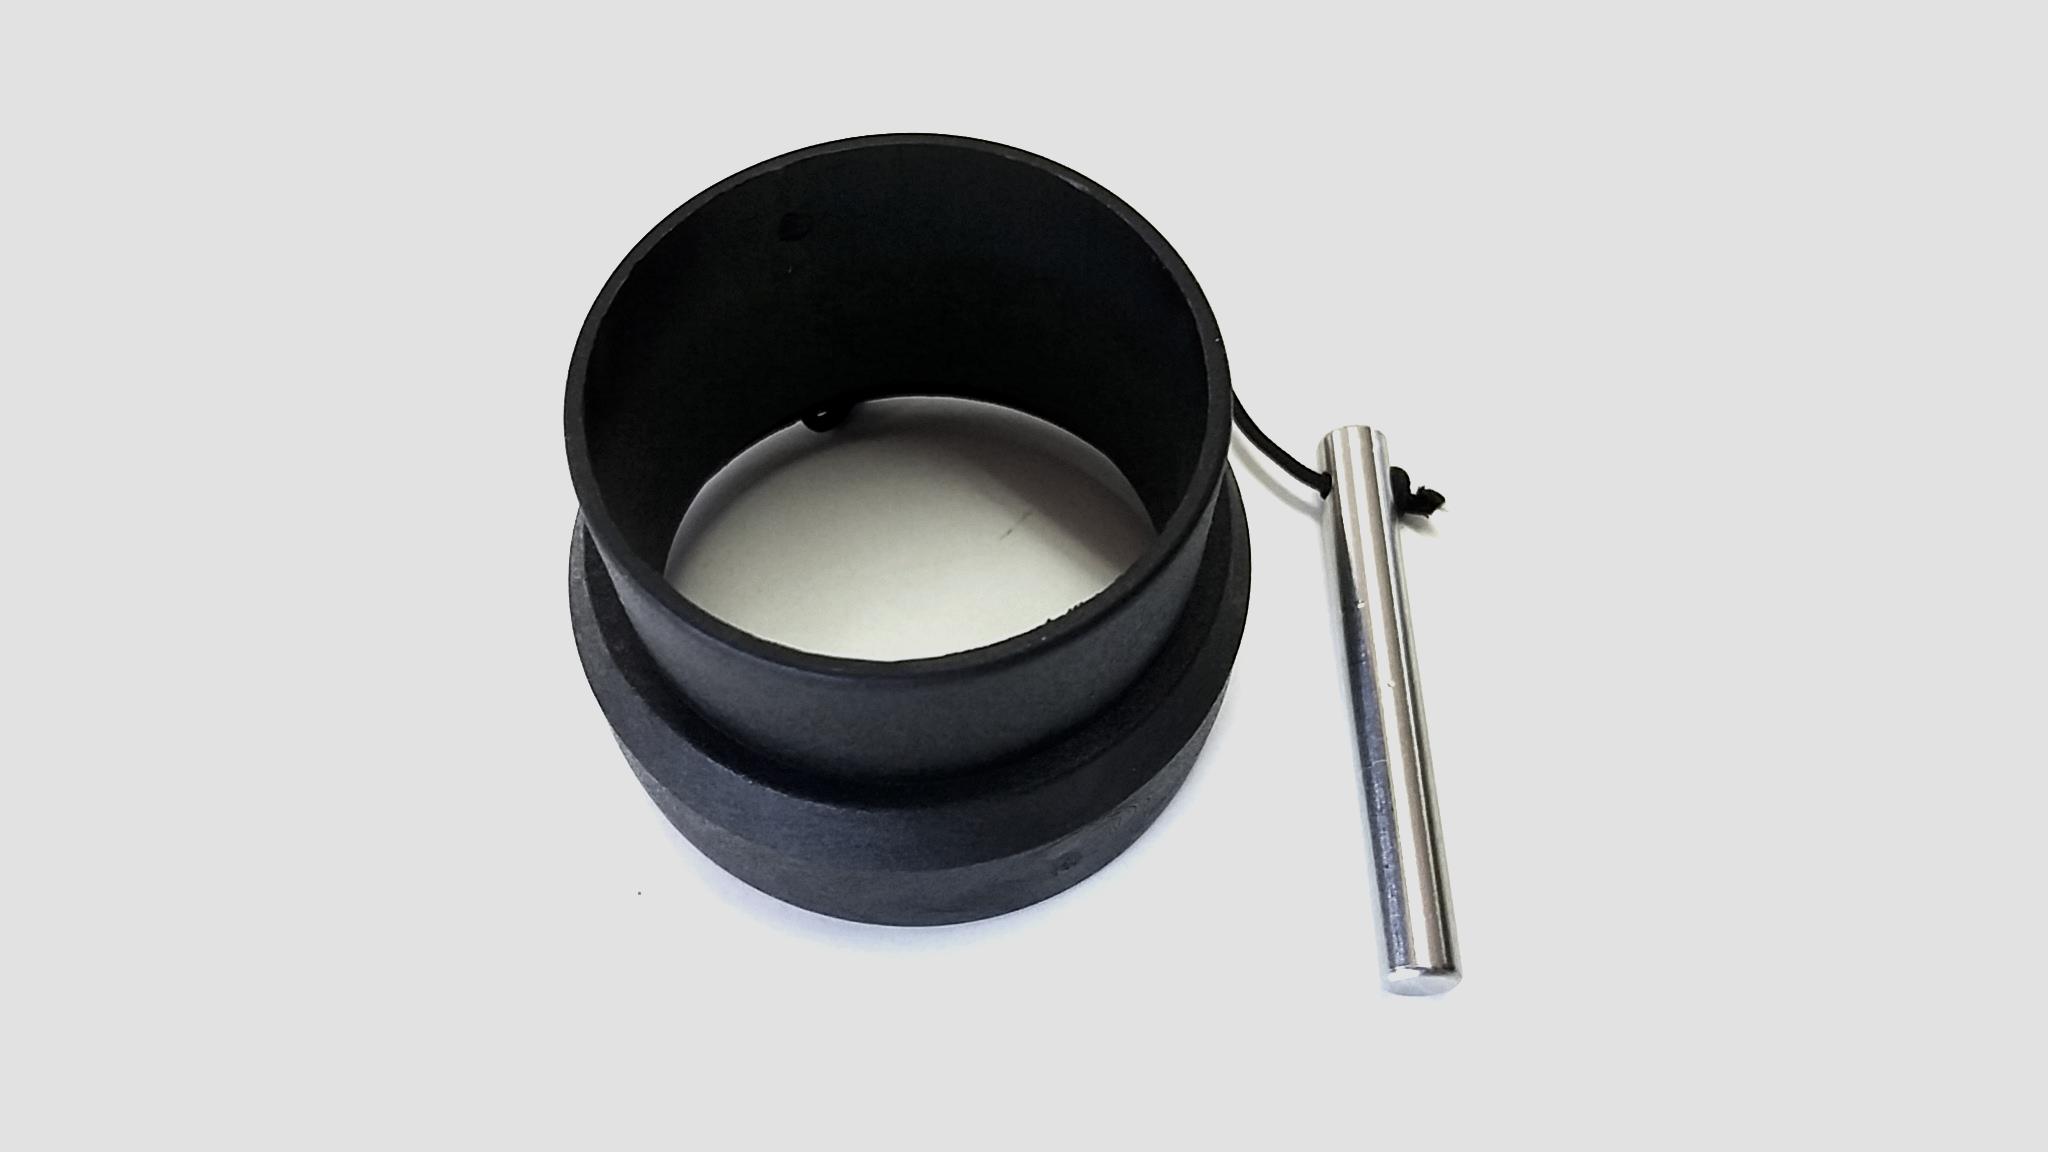 Base mástil Boge-bala10mm [CLONE] [CLONE] [CLONE] [CLONE] [CLONE] [CLONE] [CLONE] [CLONE] [CLONE]